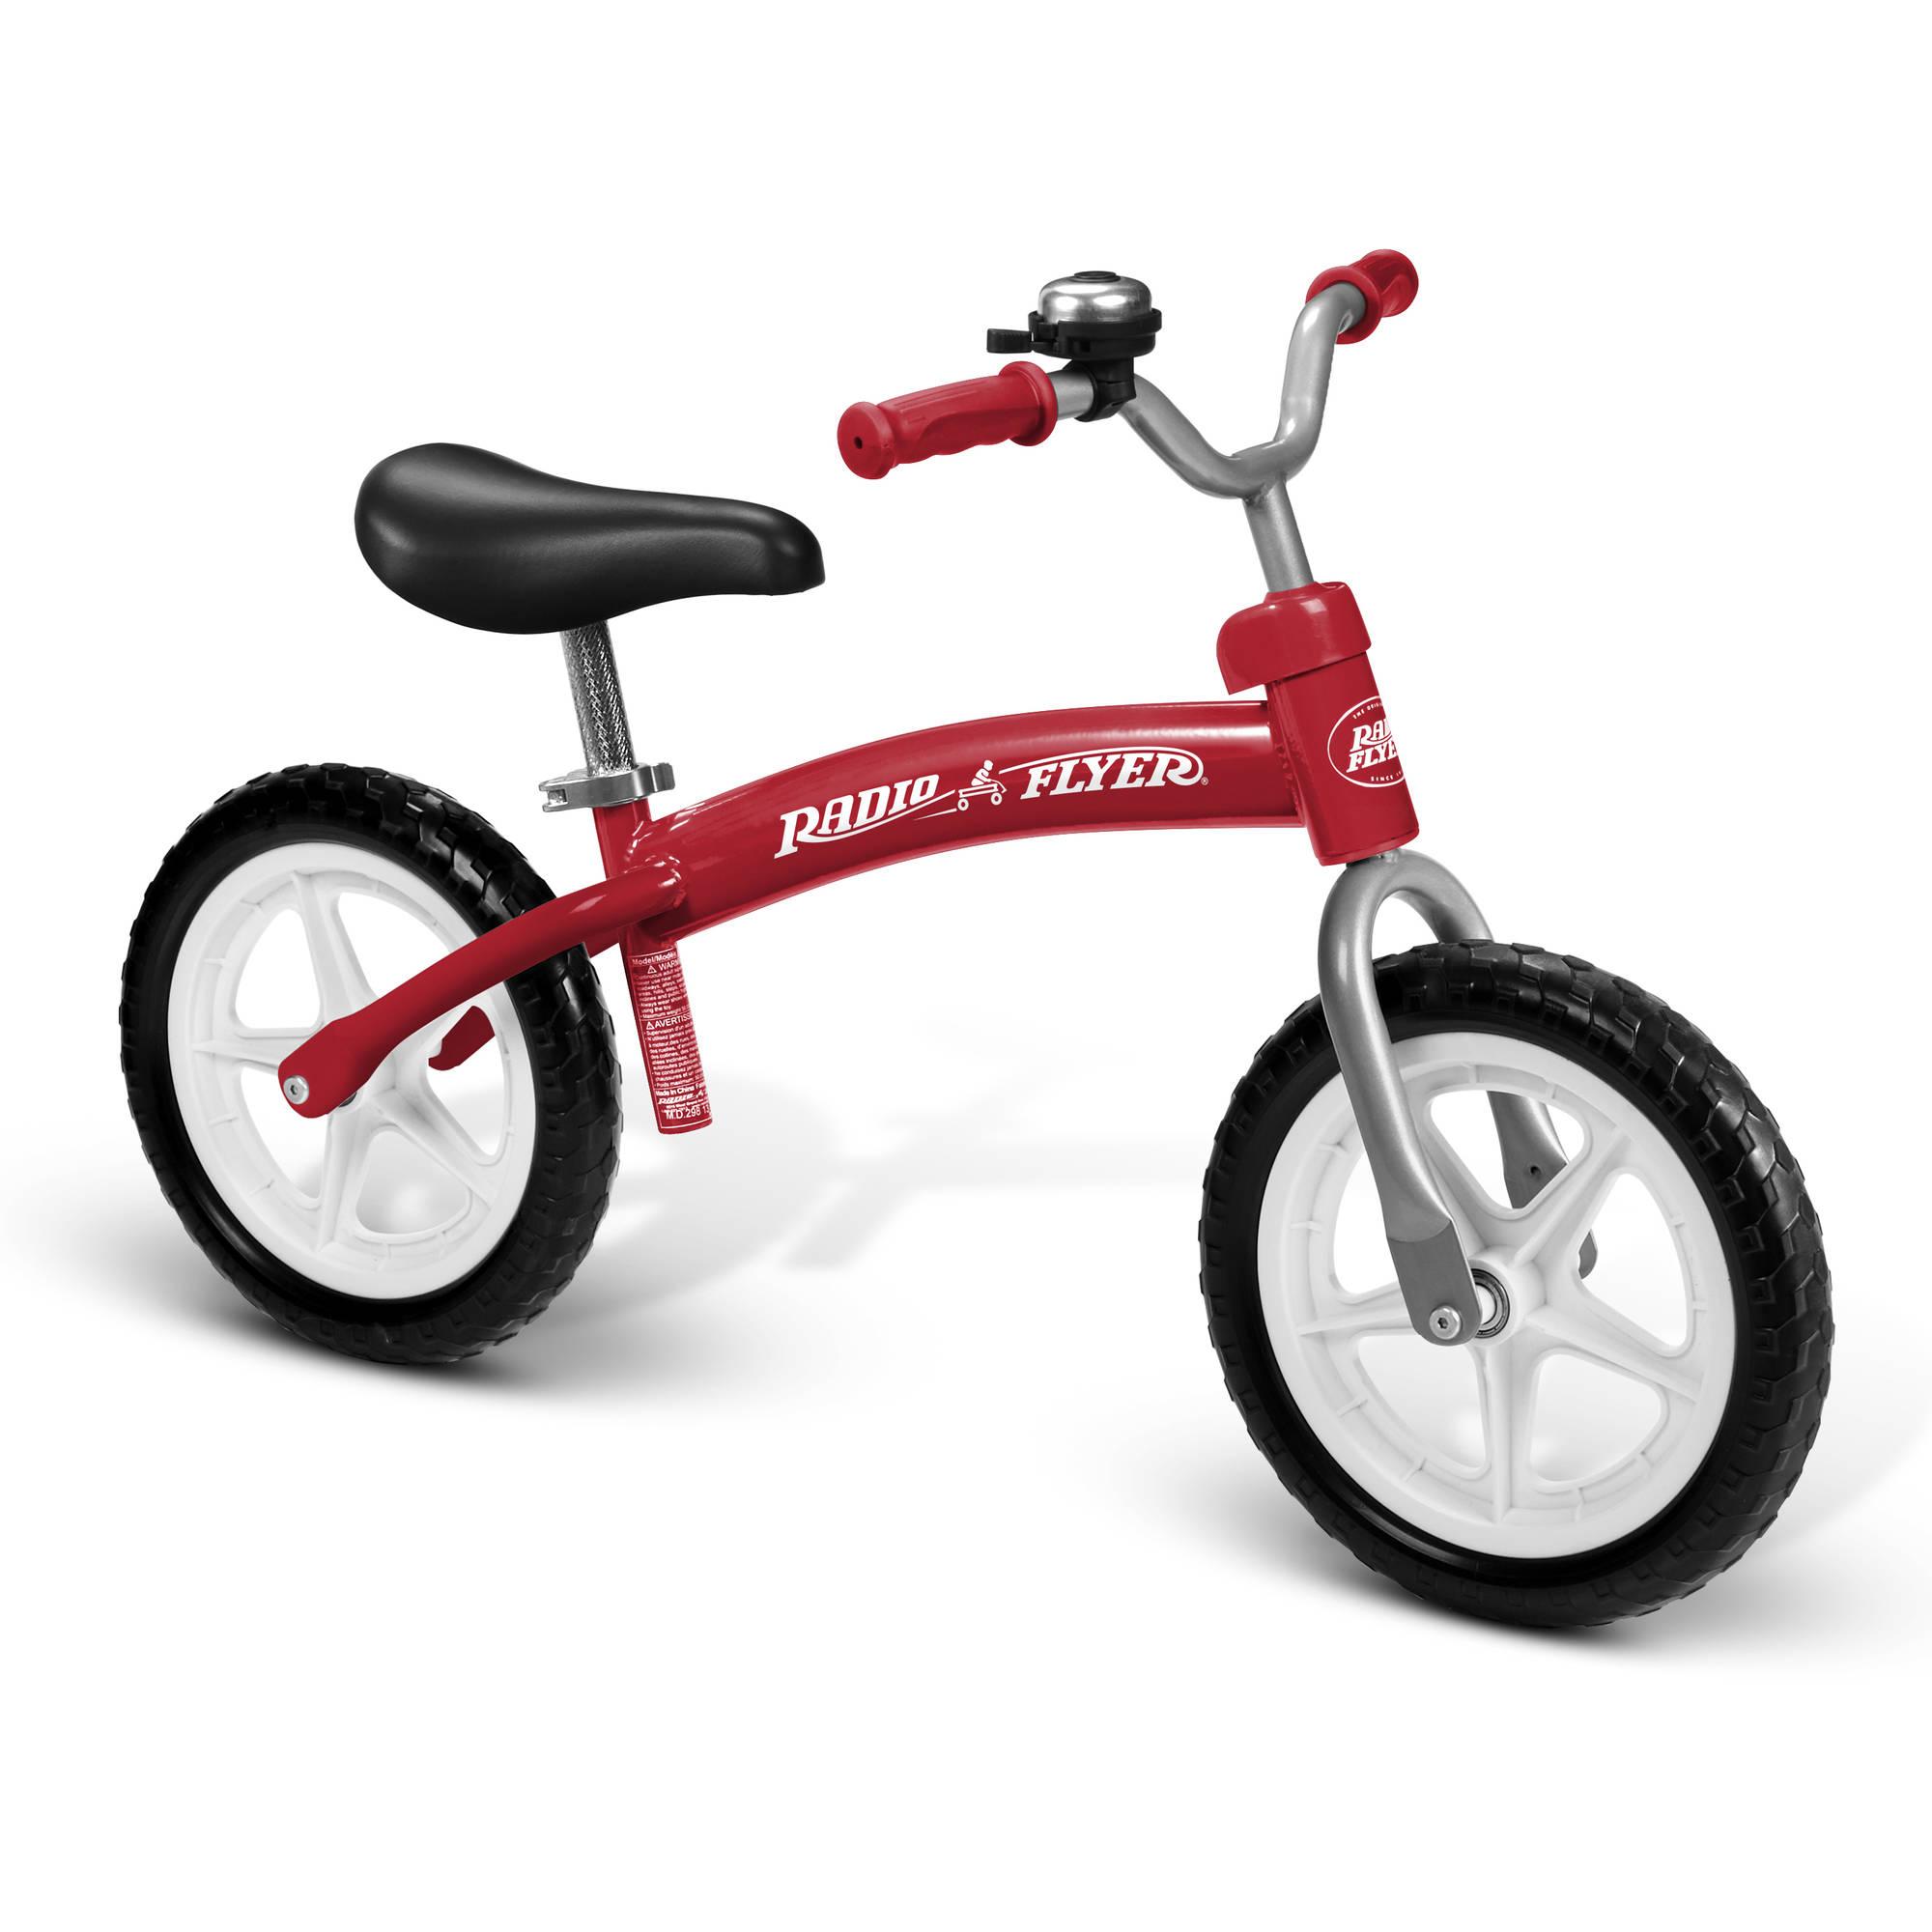 Radio Flyer Glide & Go Balance Bike, Red